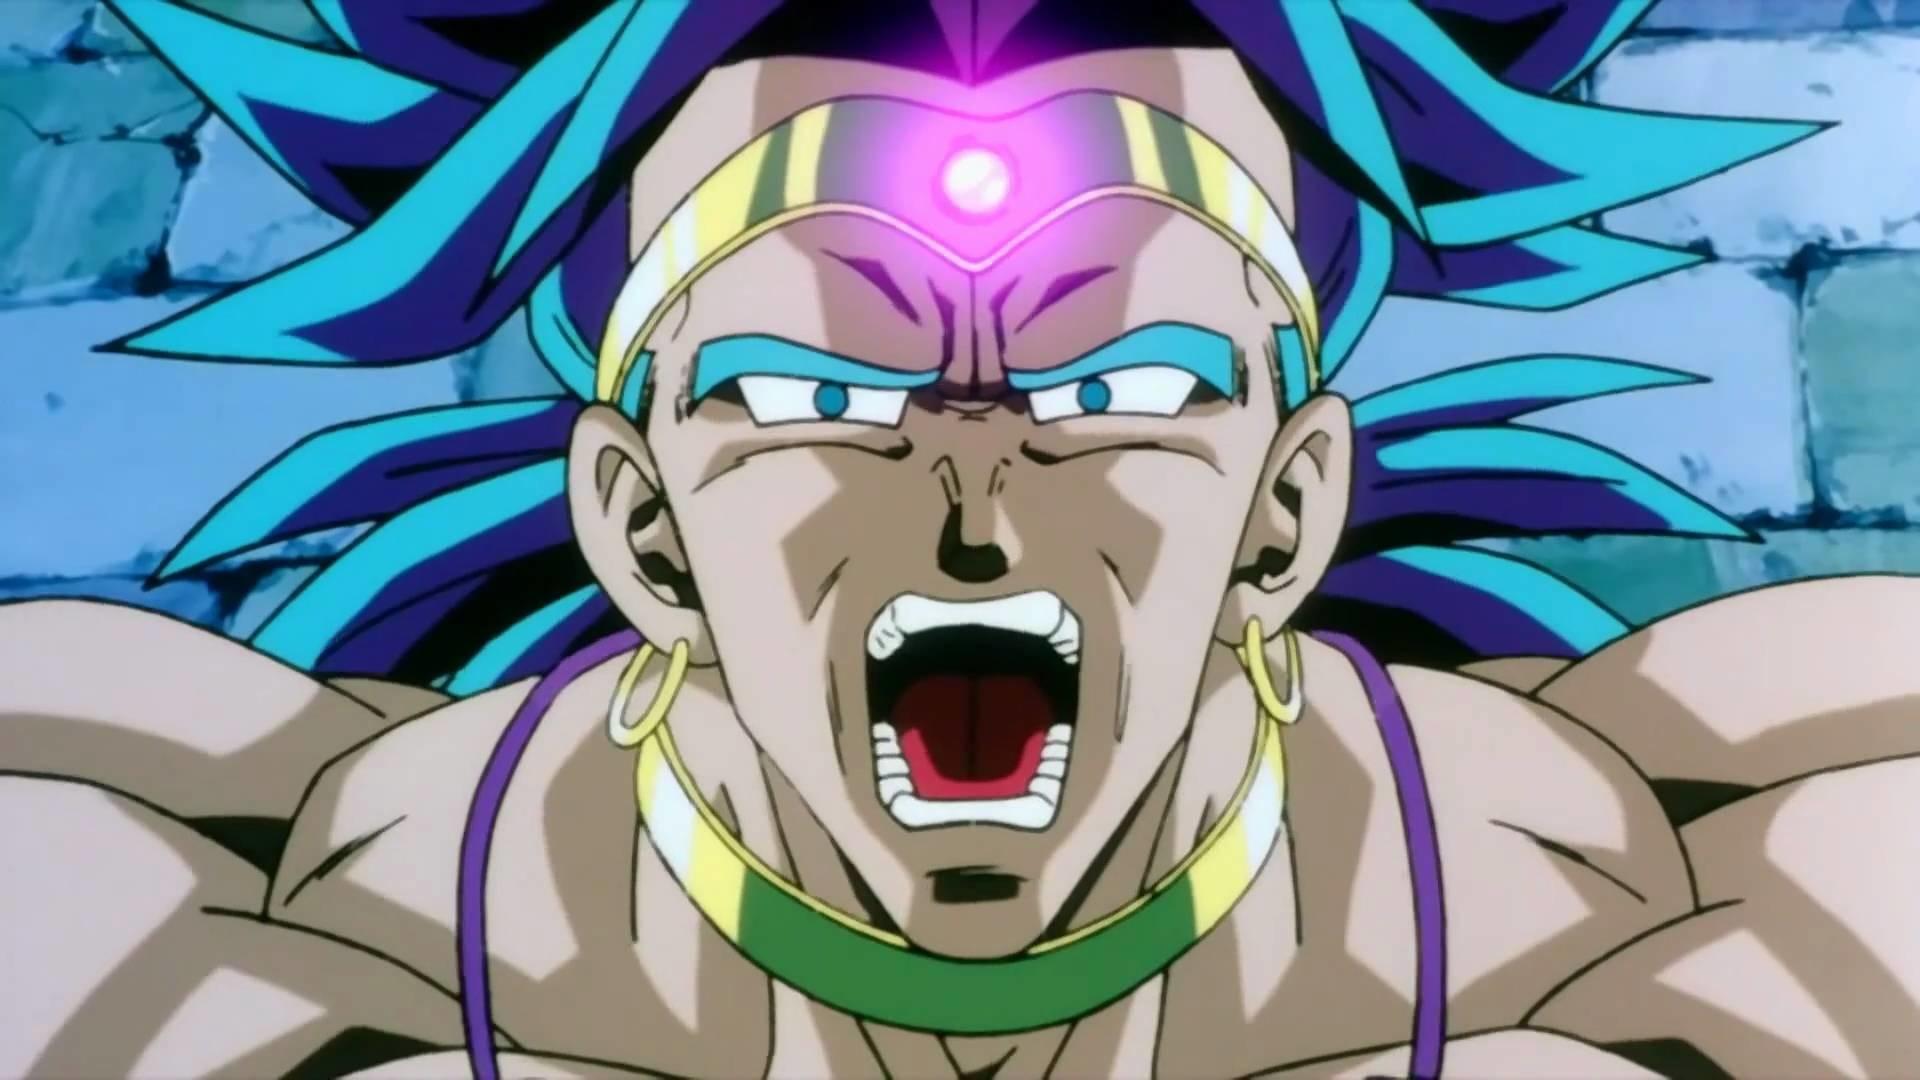 Toonami – Broly: The Legendary Super Saiyan Intro [Fan-made] (1080p HD)